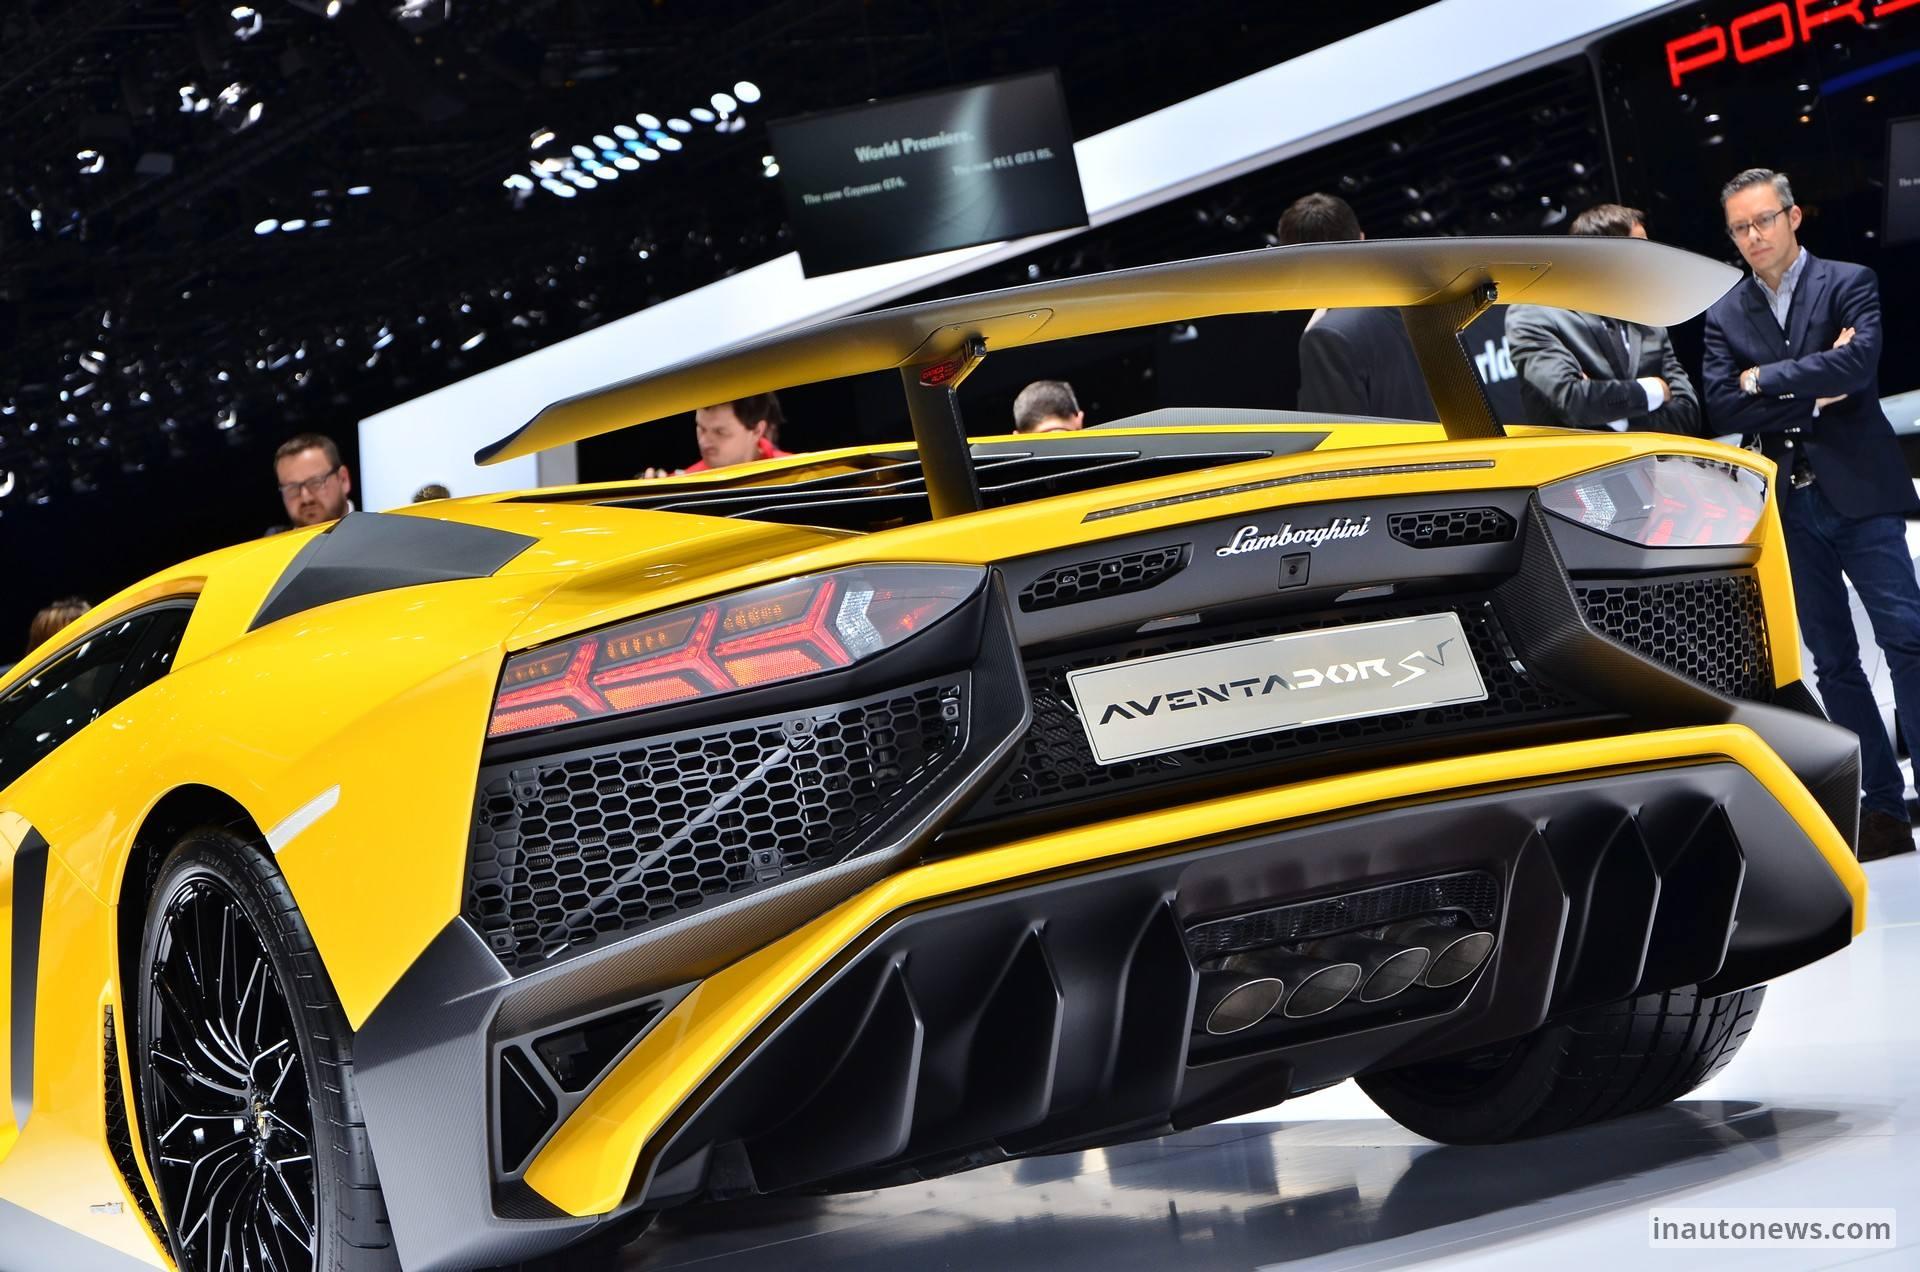 Lamborghini-Aventador-SV-Live-Geneva-2015-04